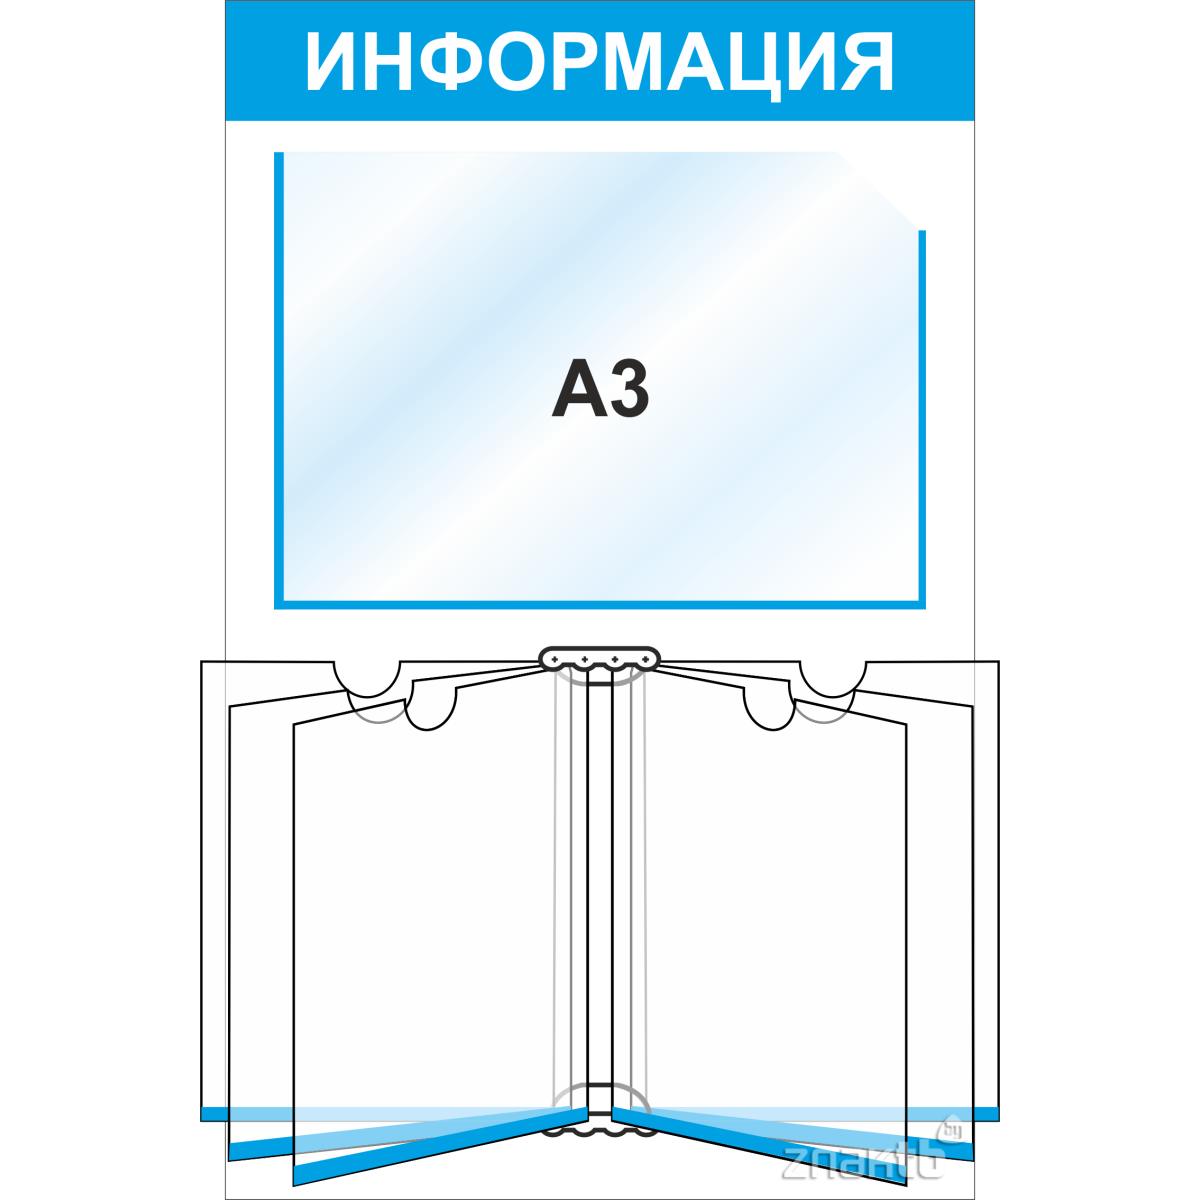 Стенд информационный 3209, 720*510  мм, карман А3, книга А4